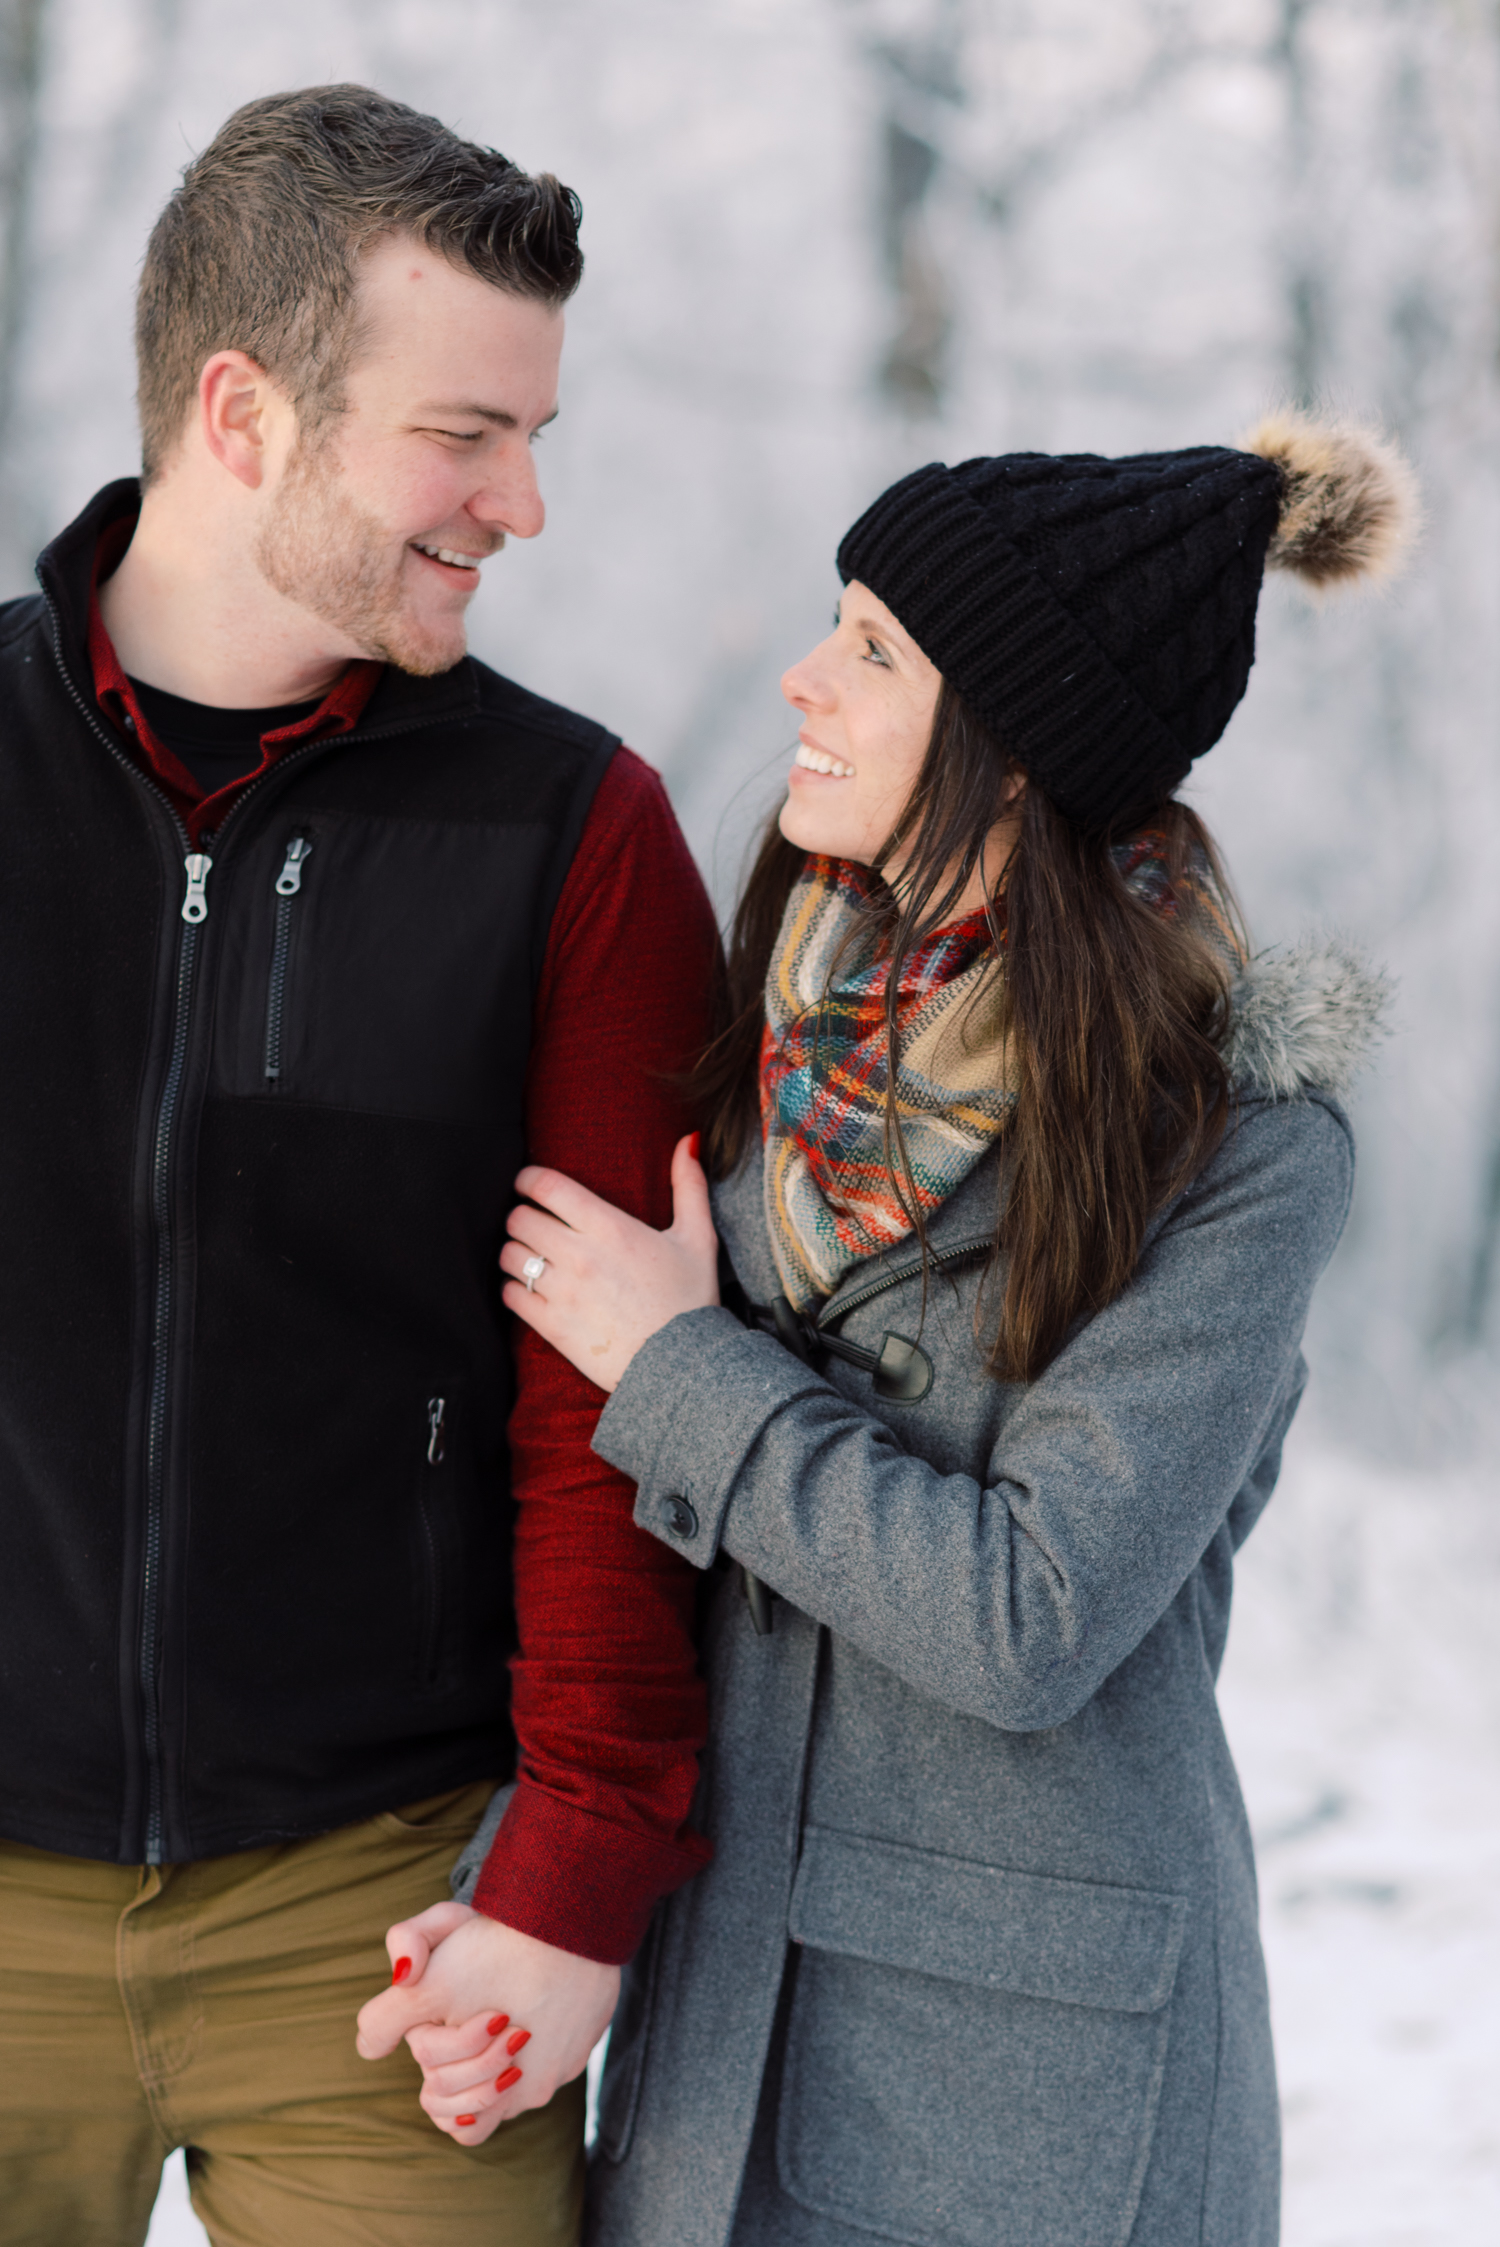 snowy-georgia-proposal-preachers-rock-atlanta-dahlonega-wedding-photographer-hannah-forsberg-fine-art-film-21.jpg